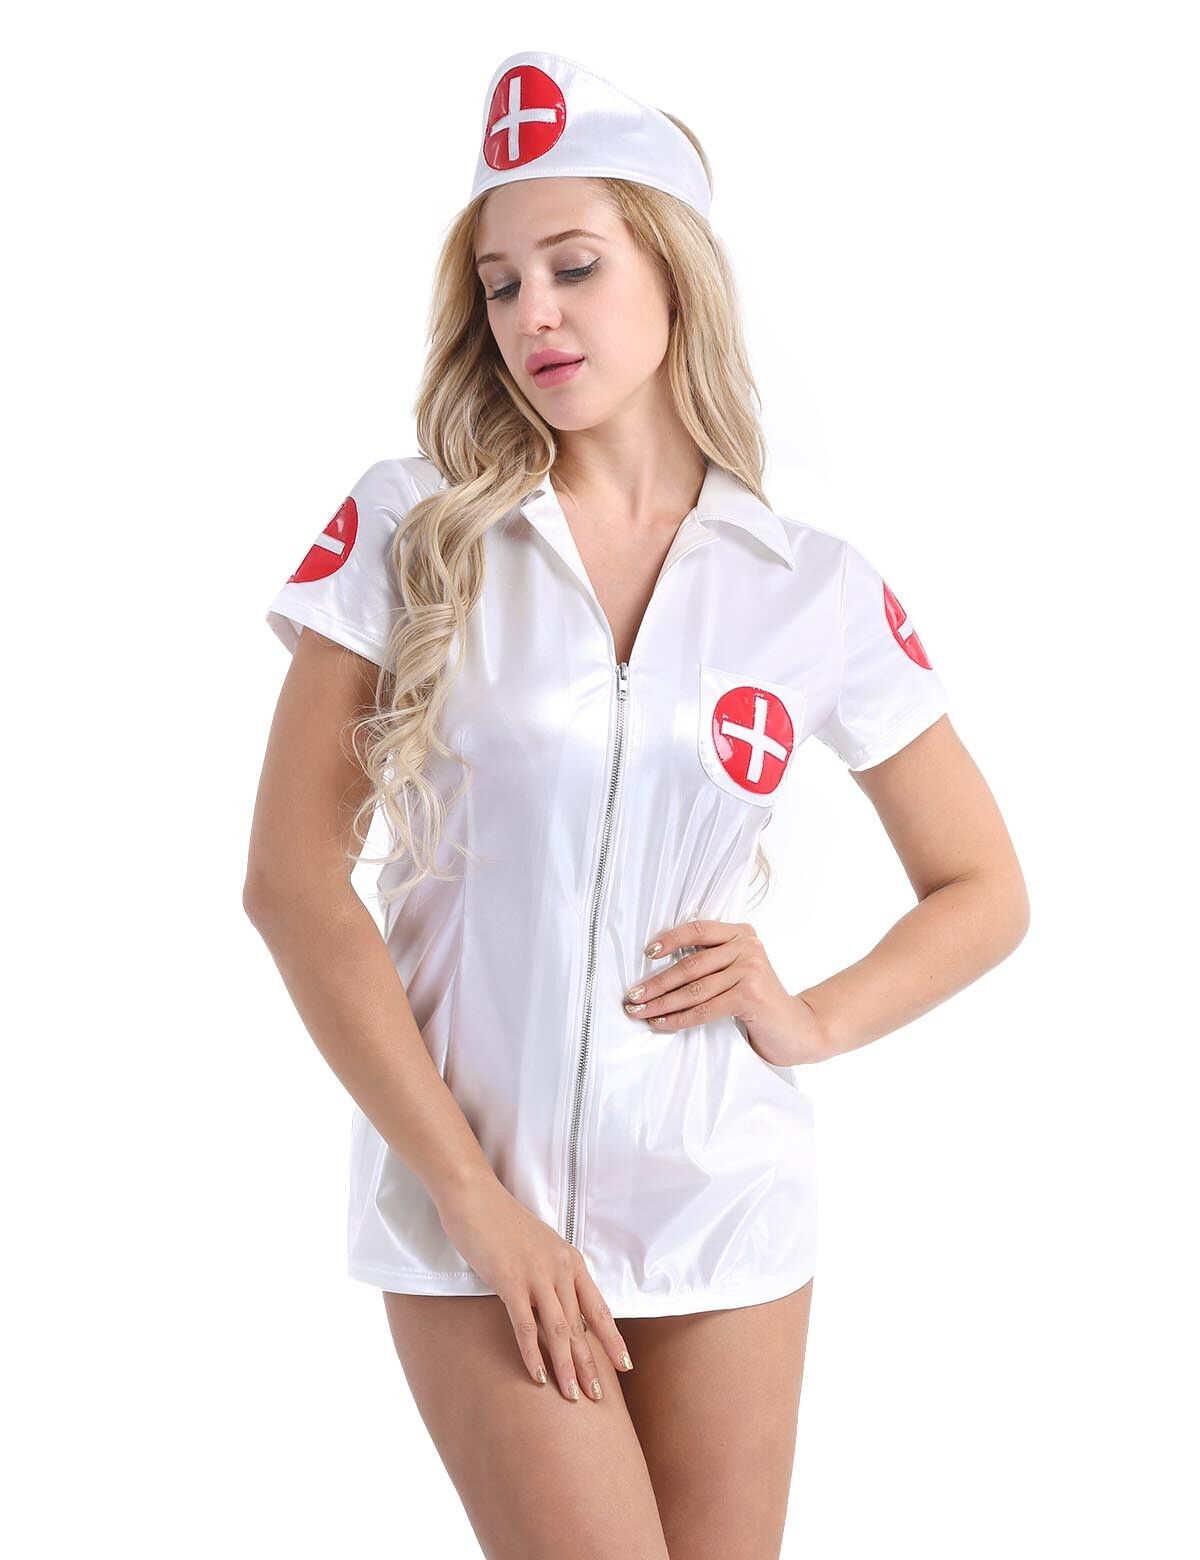 CL360 Ladies Nurse Naughty Medical Doctor ER Hospital Fancy Dress Party Costume